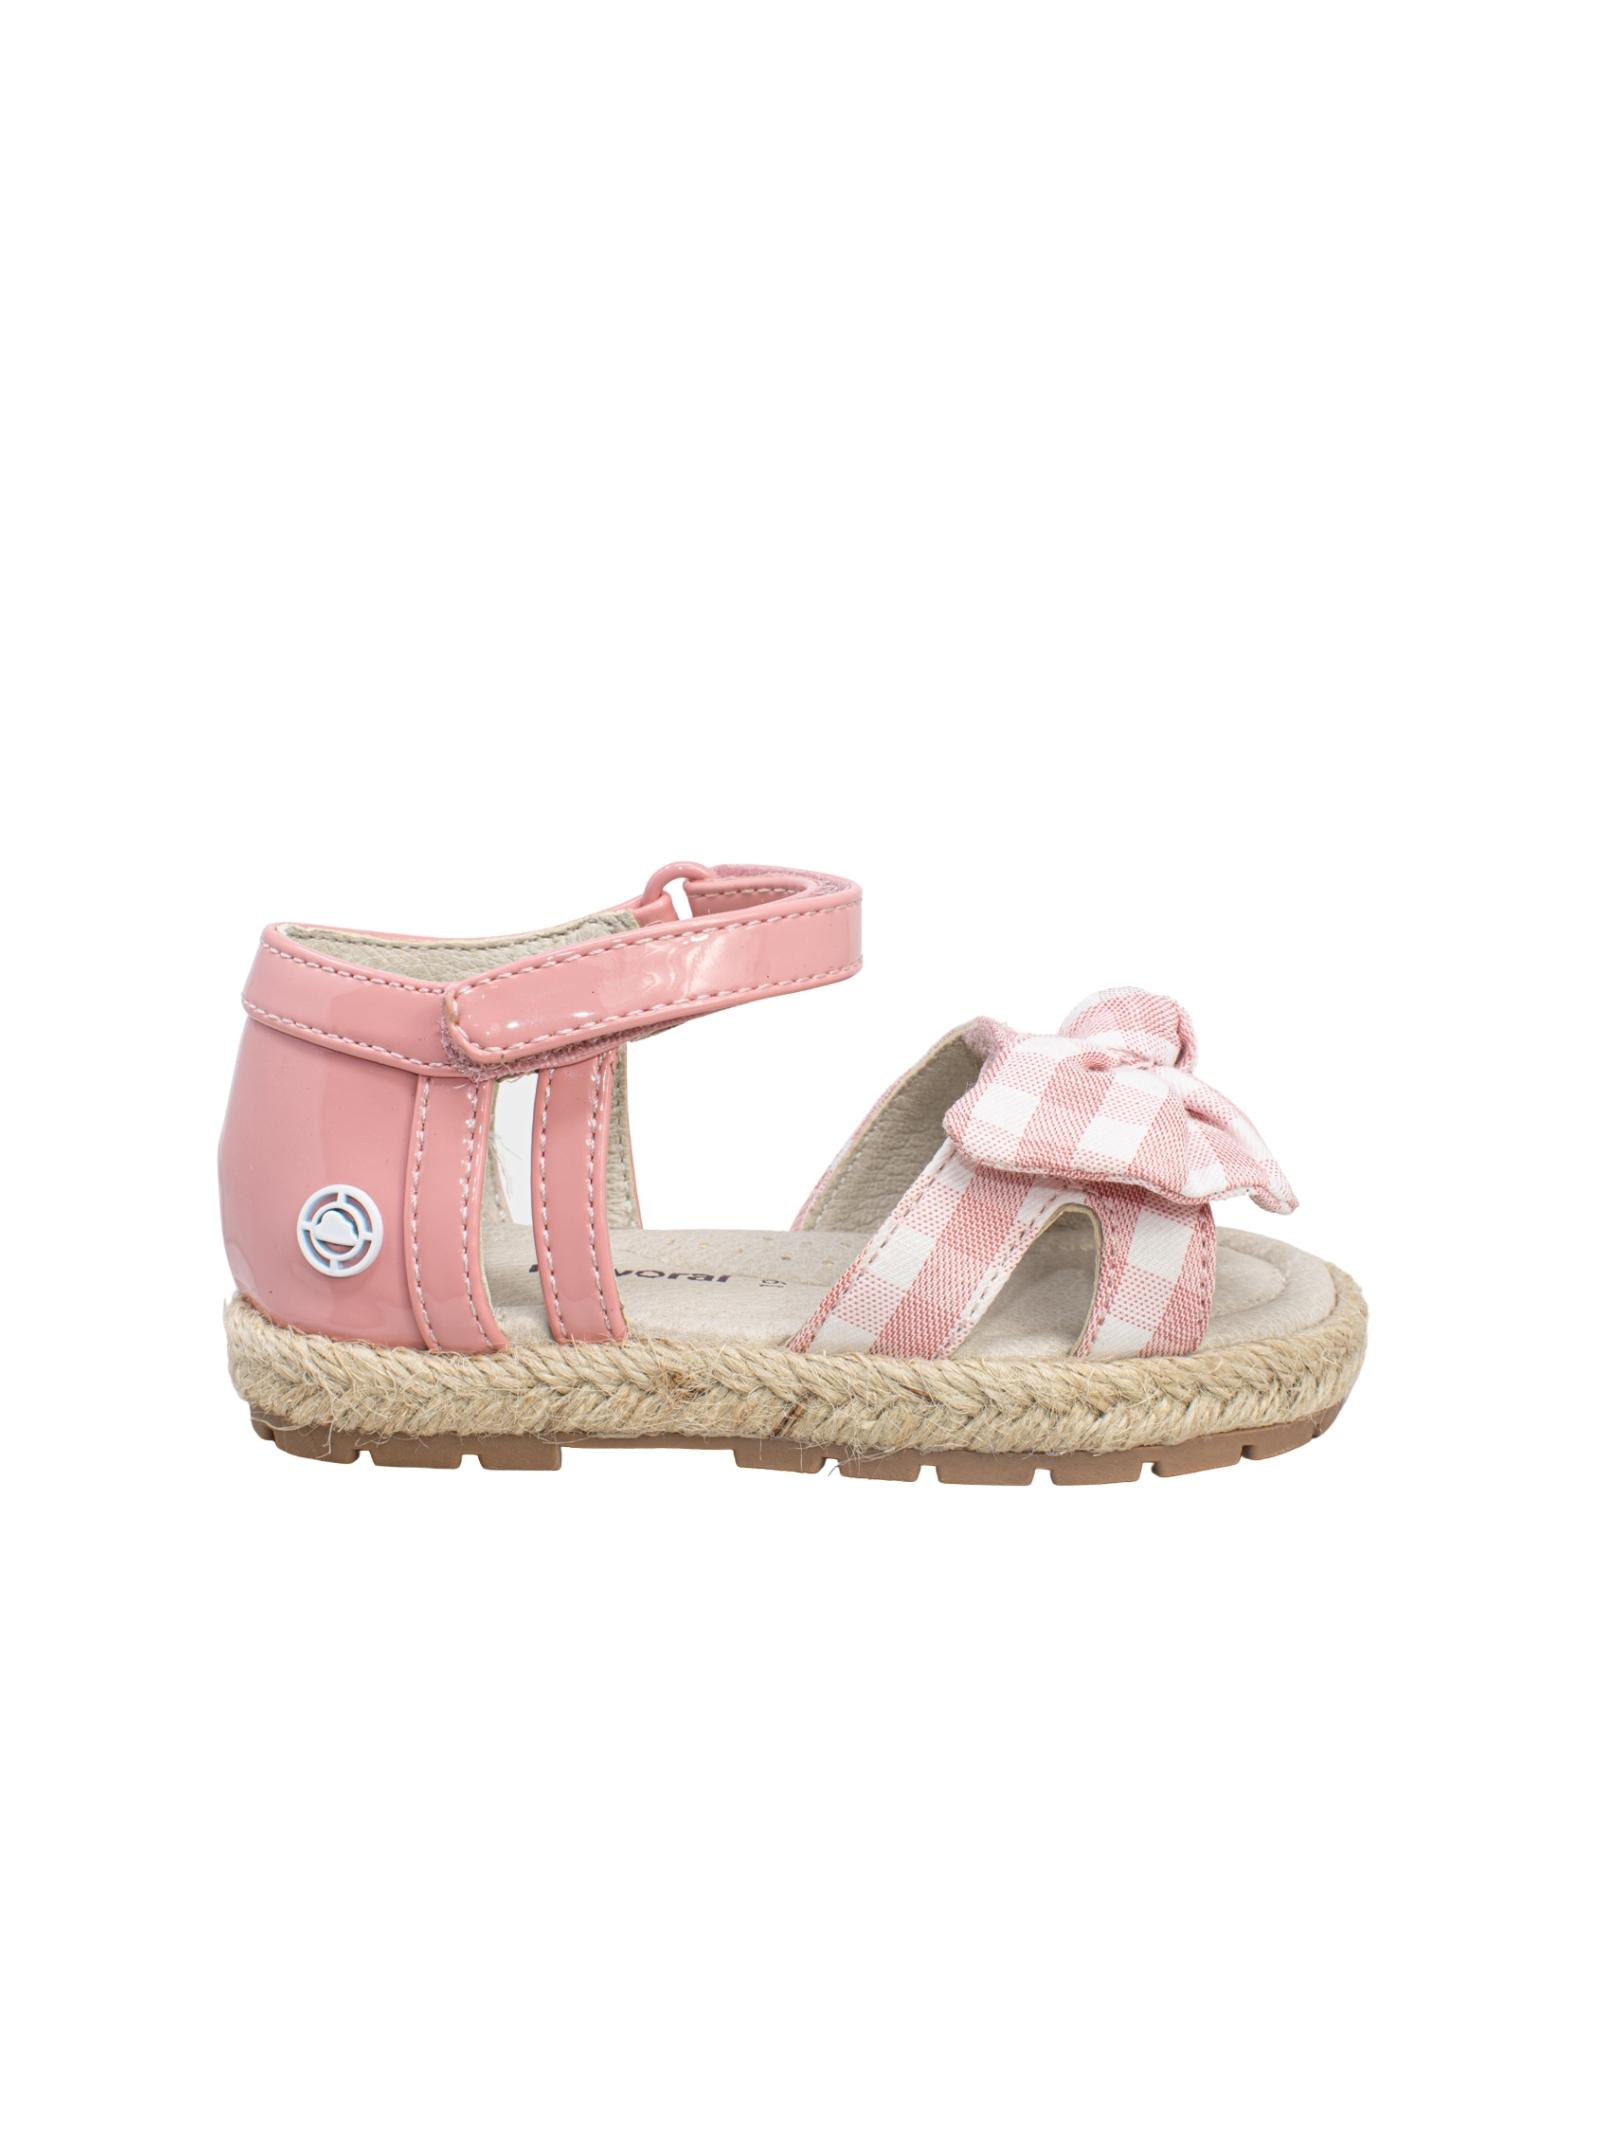 Sandalo Pink Juta MAYORAL | Sandali | 41270034